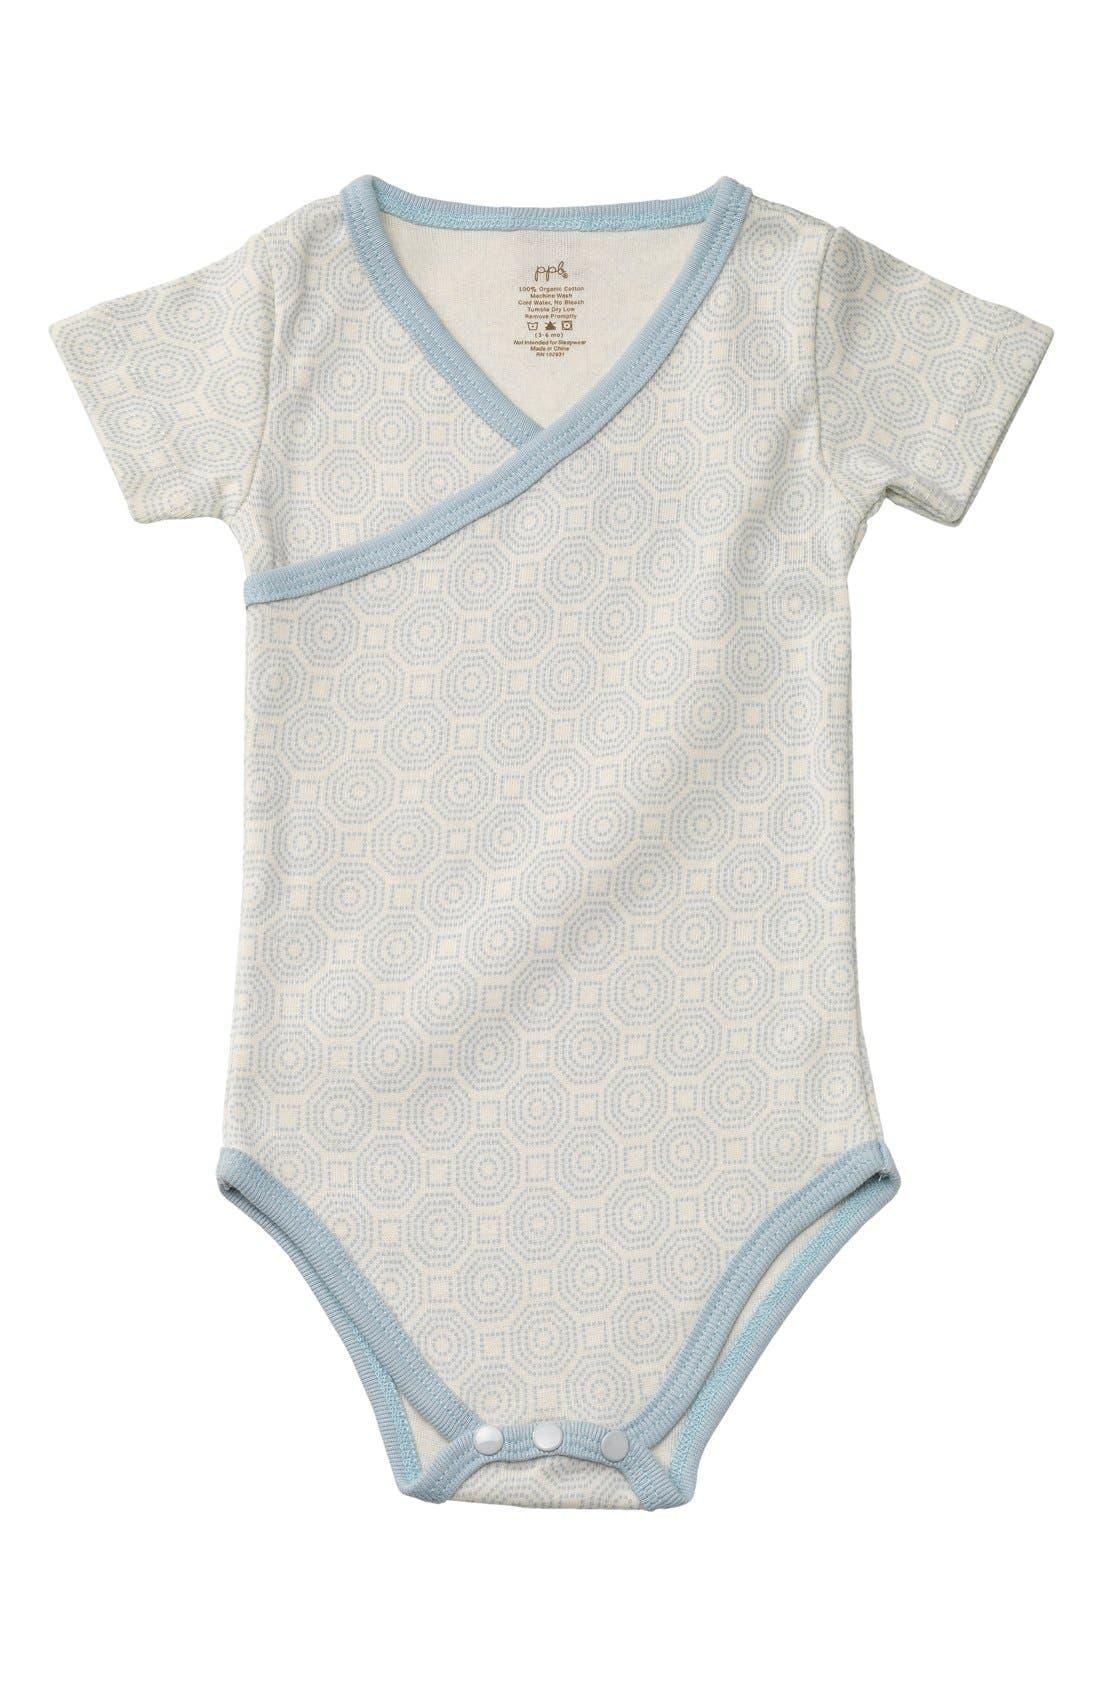 Alternate Image 1 Selected - Petunia Pickle Bottom Organic Cotton Short Sleeve Bodysuit (Baby)